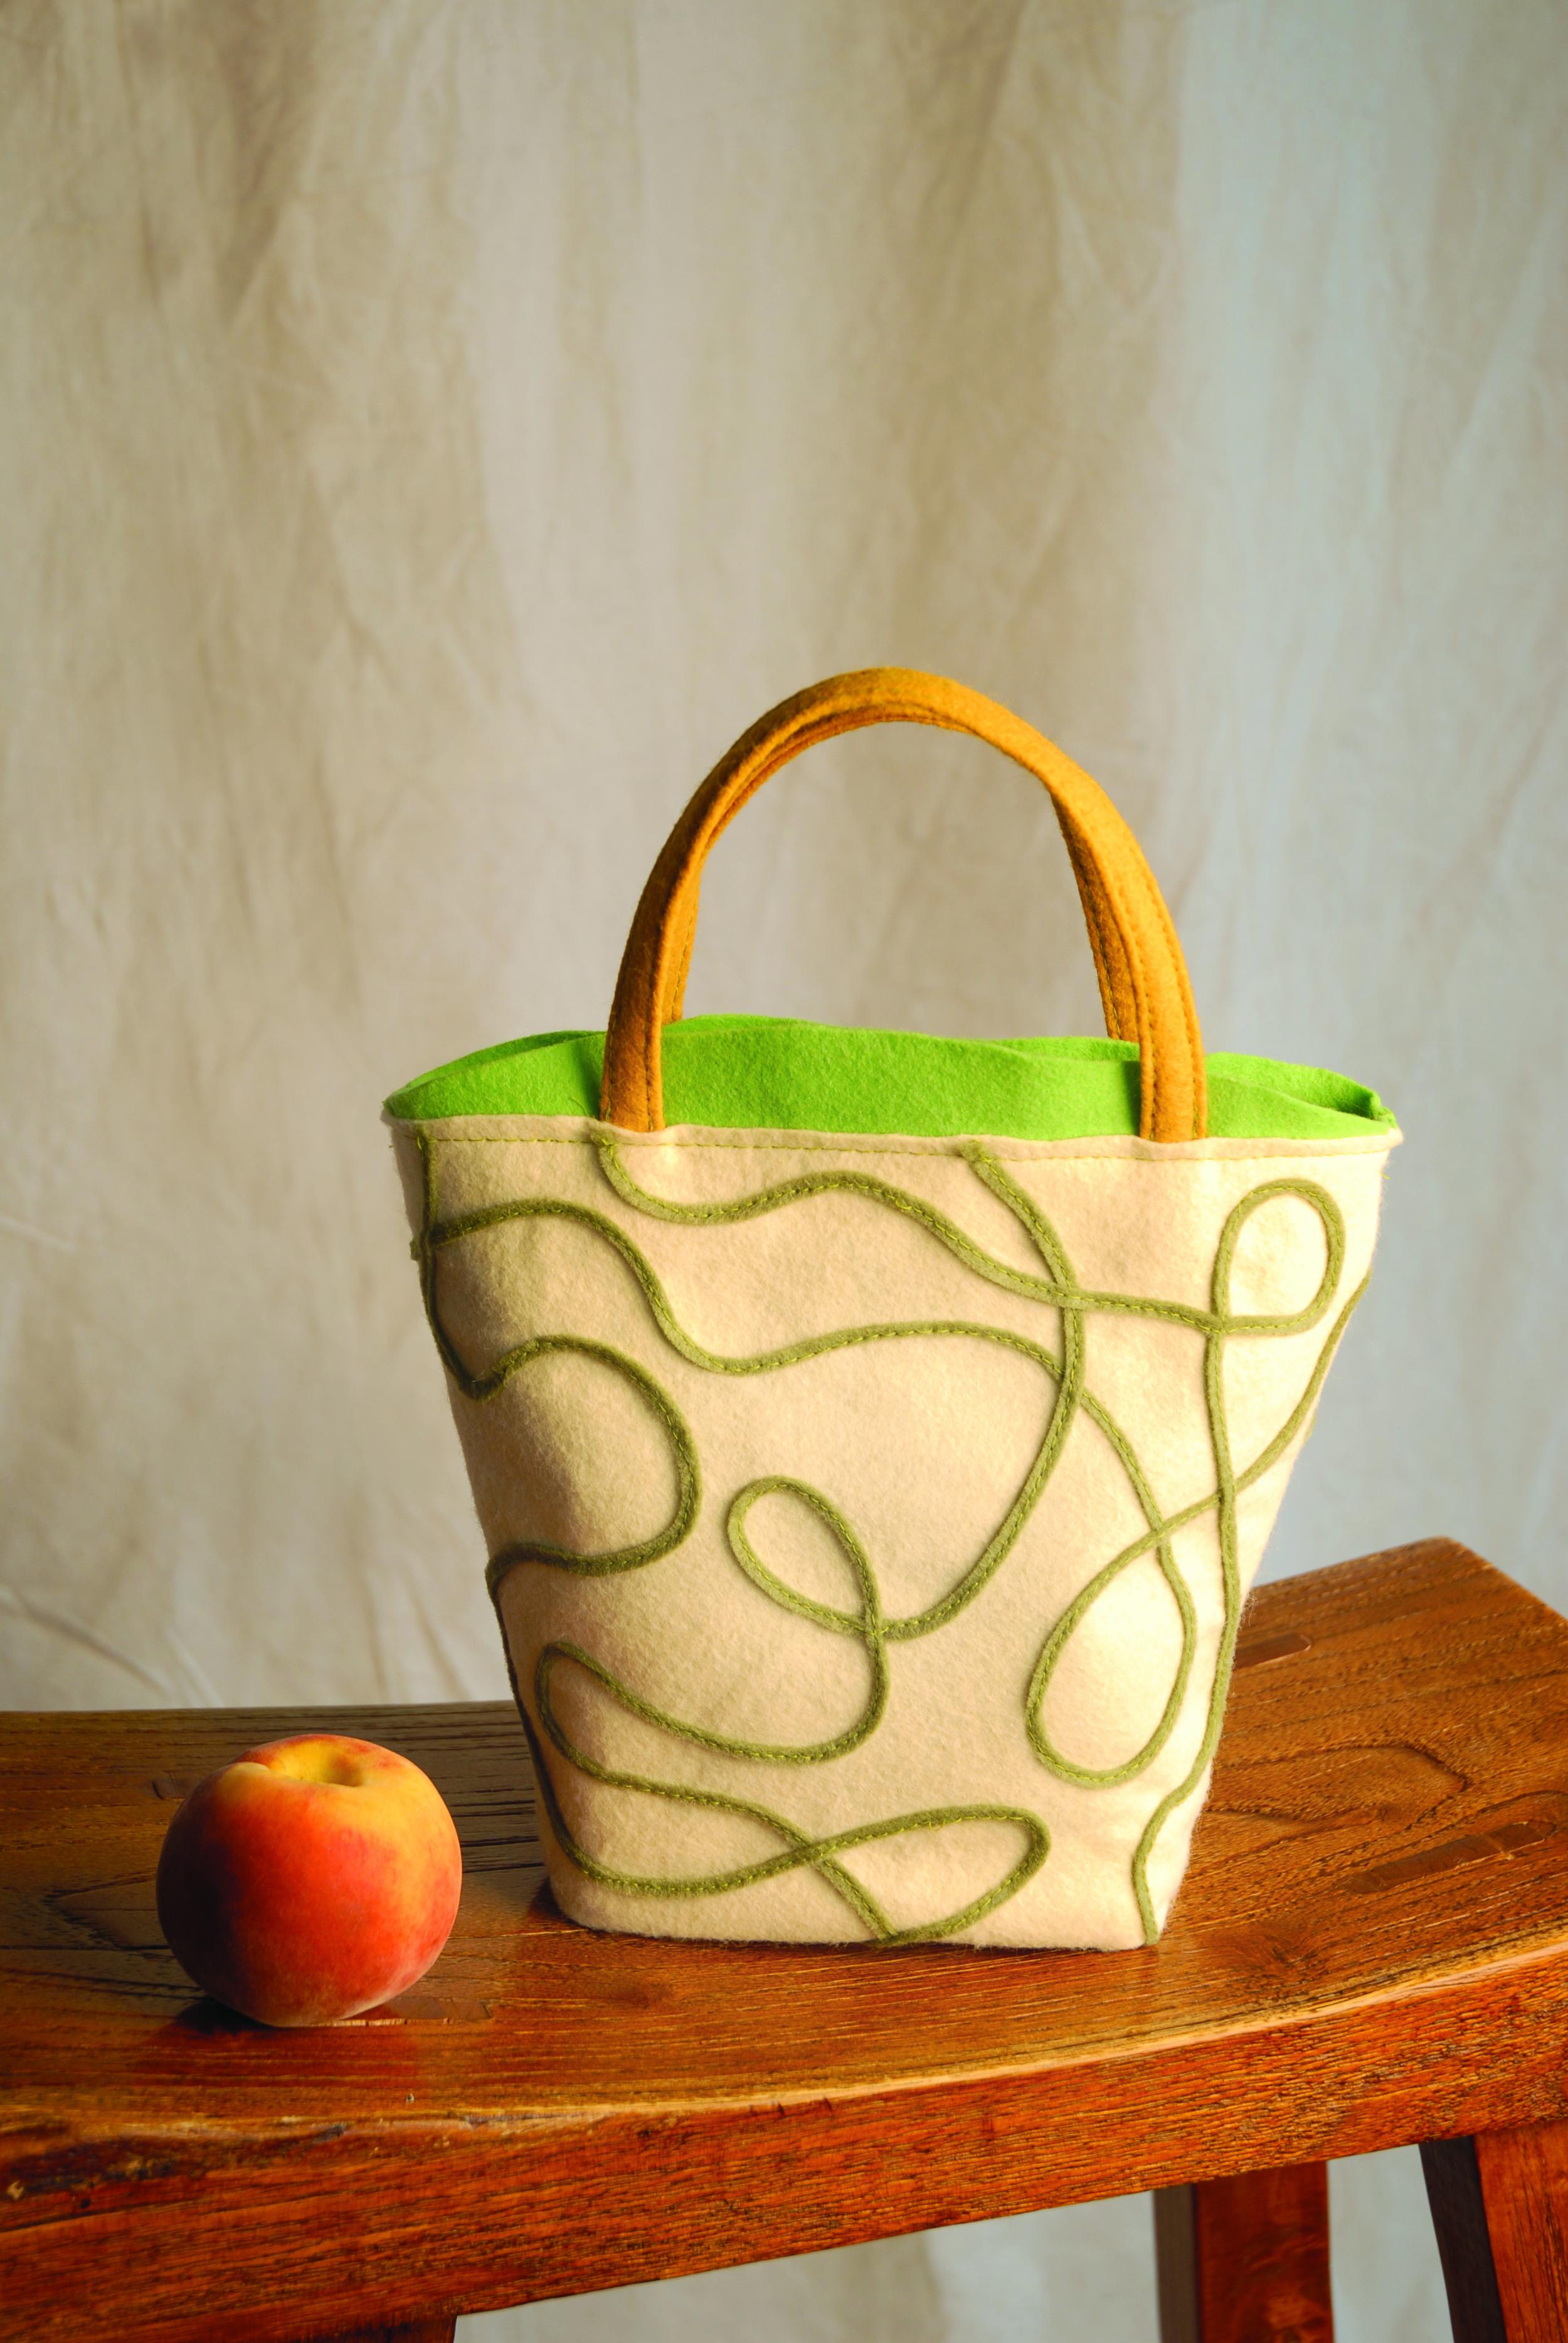 wiggly bag peach.jpg